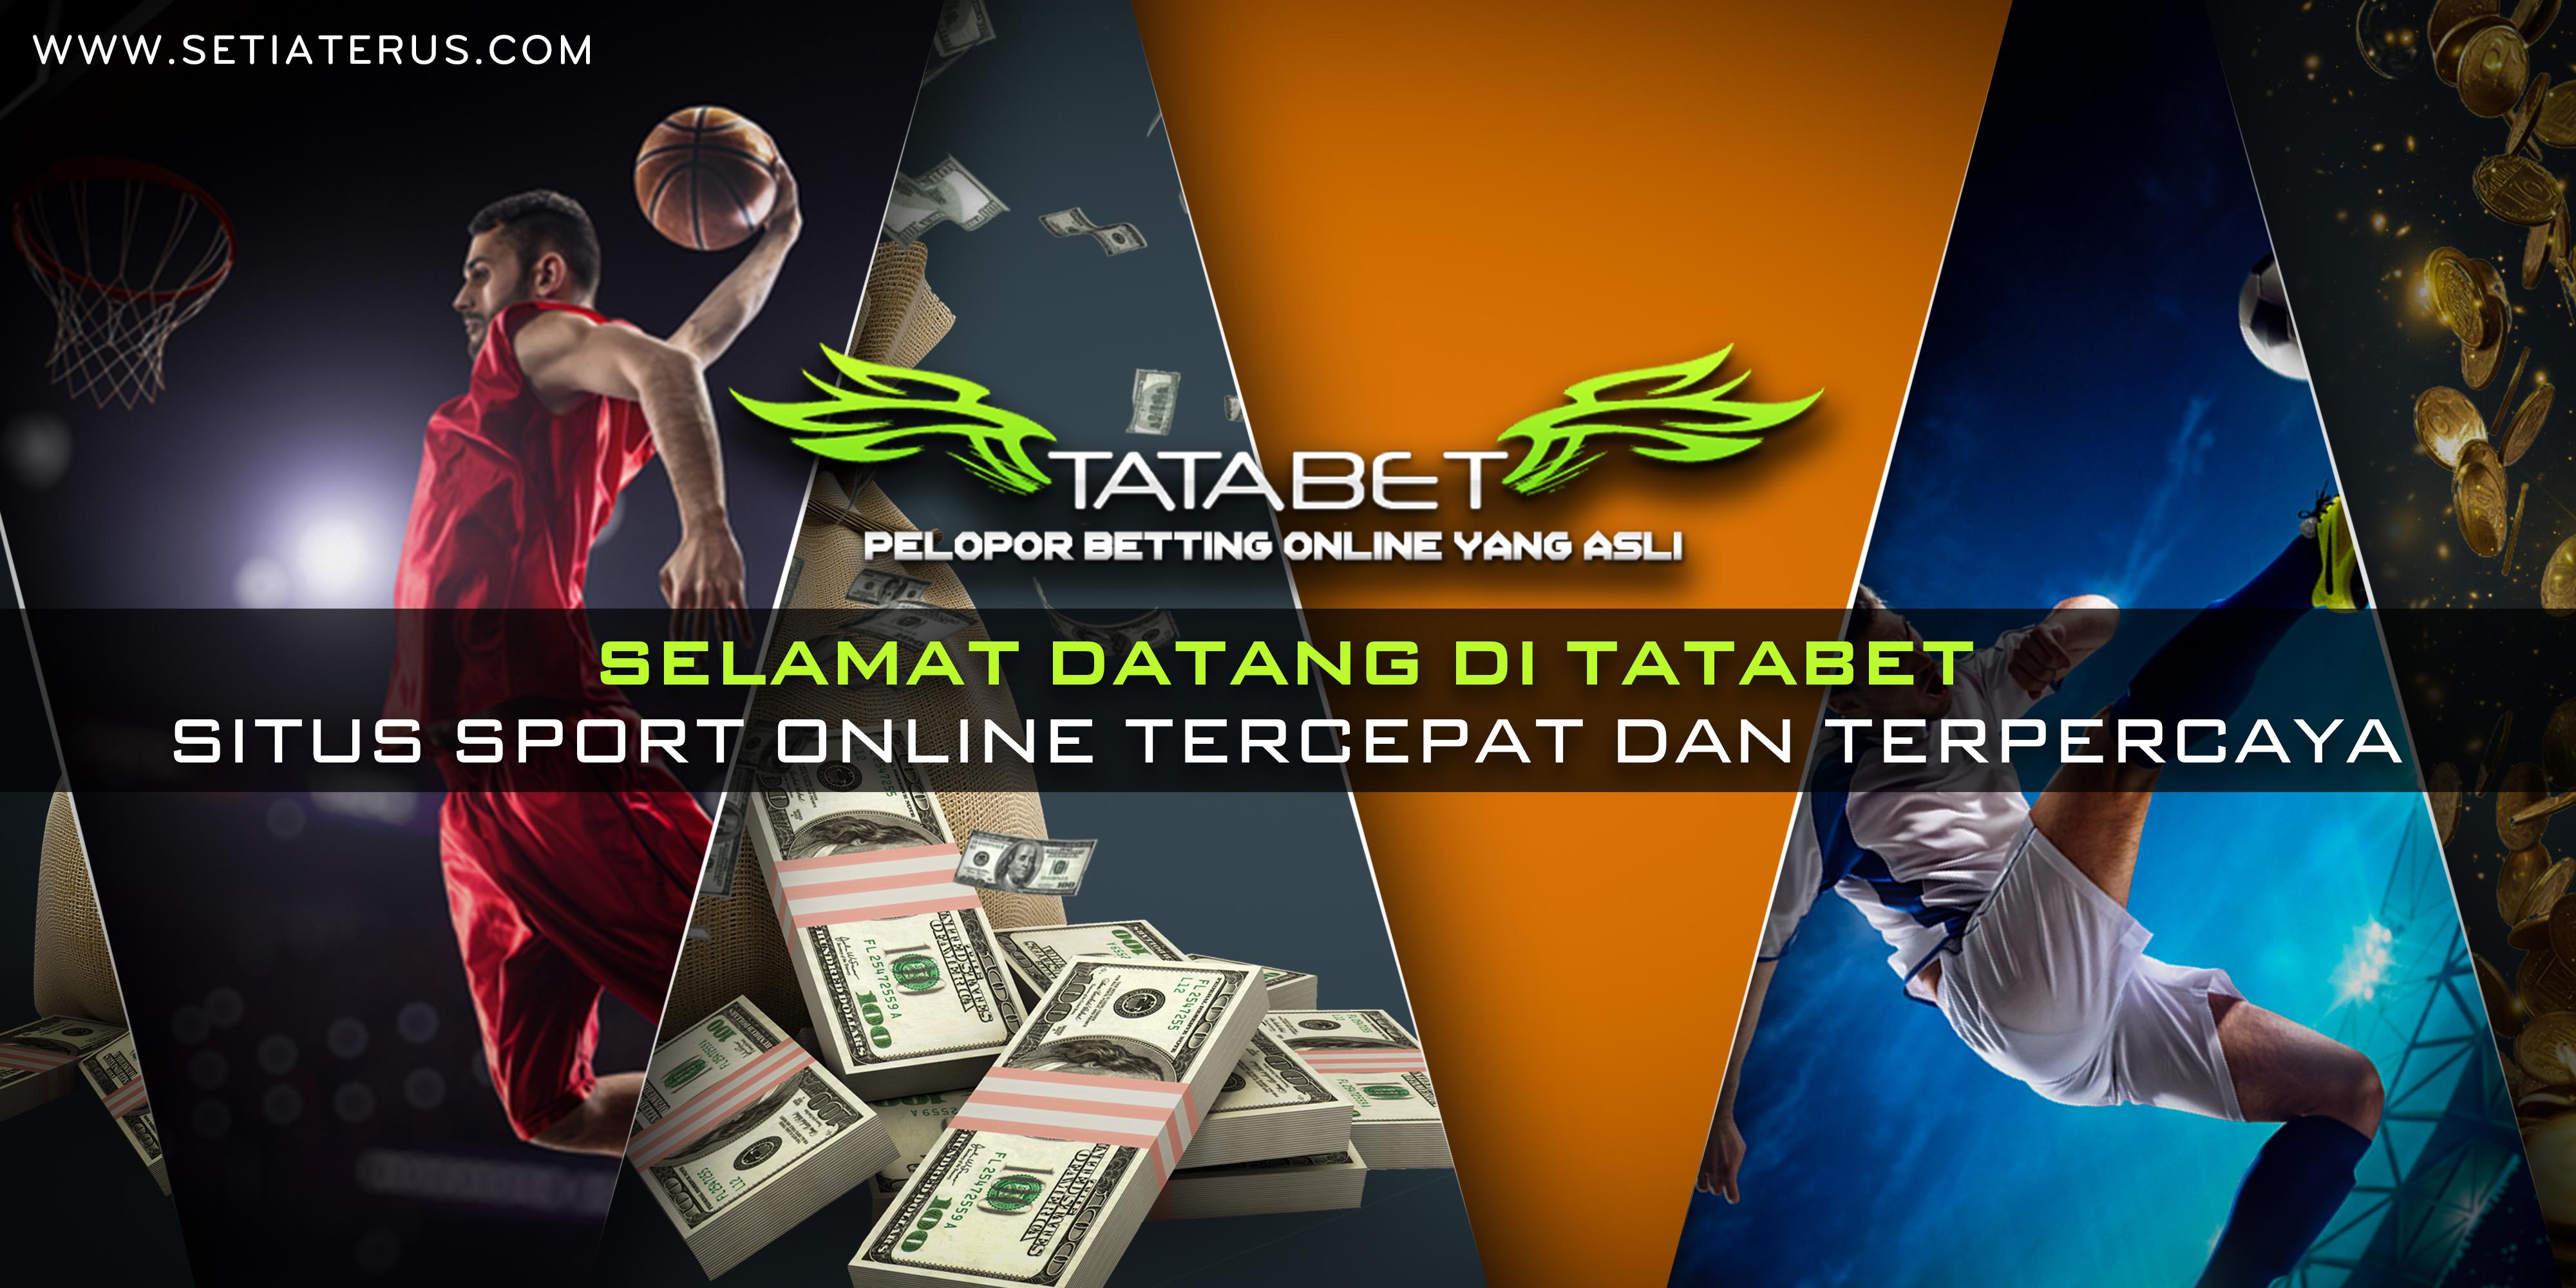 Sbobet, Casino Sbobet, IBC BET, Agen Bola, Mix Parlay